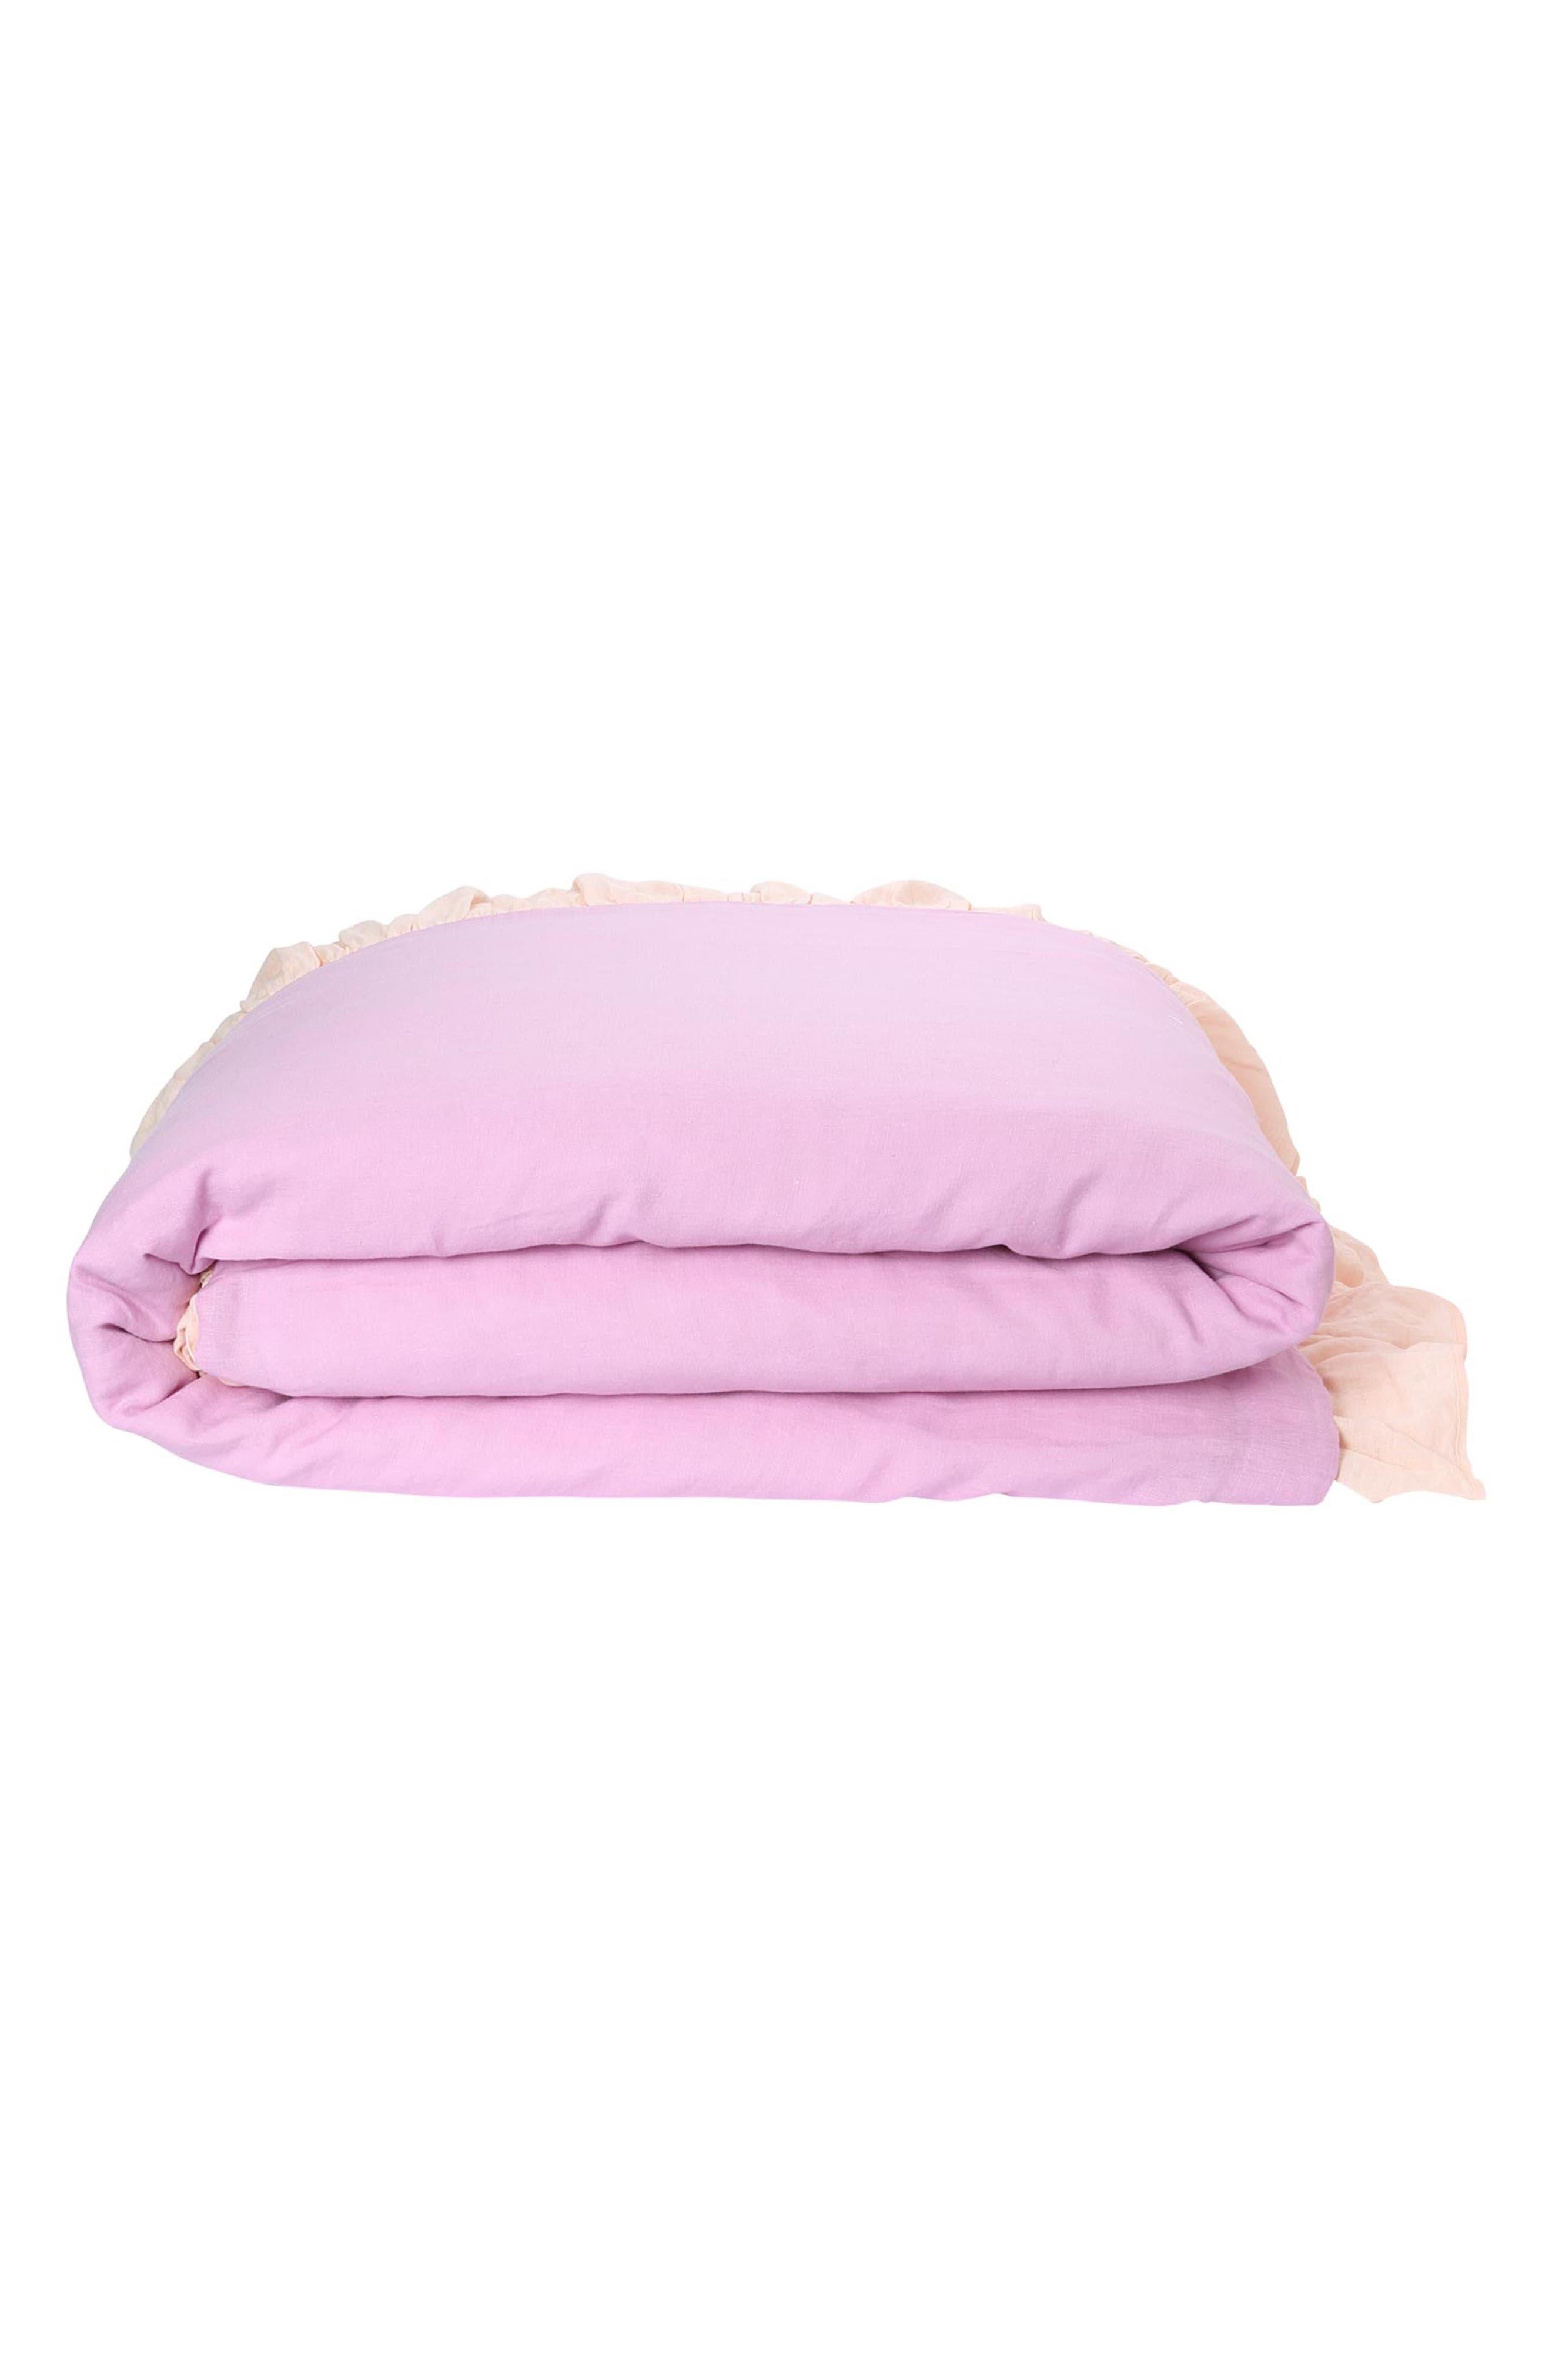 Ruffle Reversible Linen Comforter,                         Main,                         color, 900